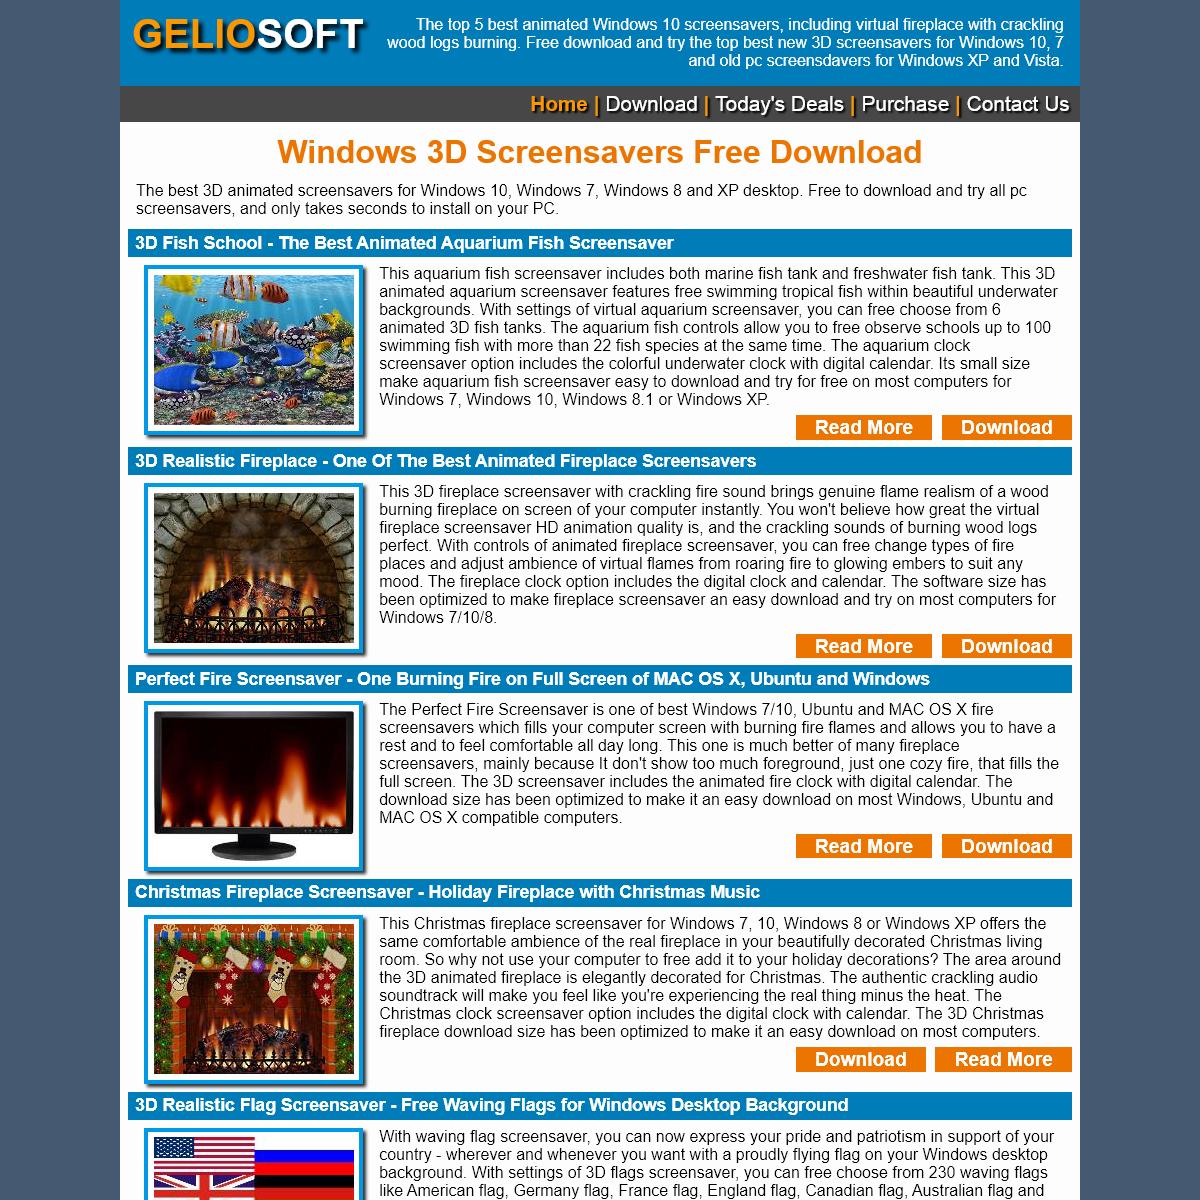 Windows Screensaver - Free 3D Fireplace Screensavers Download